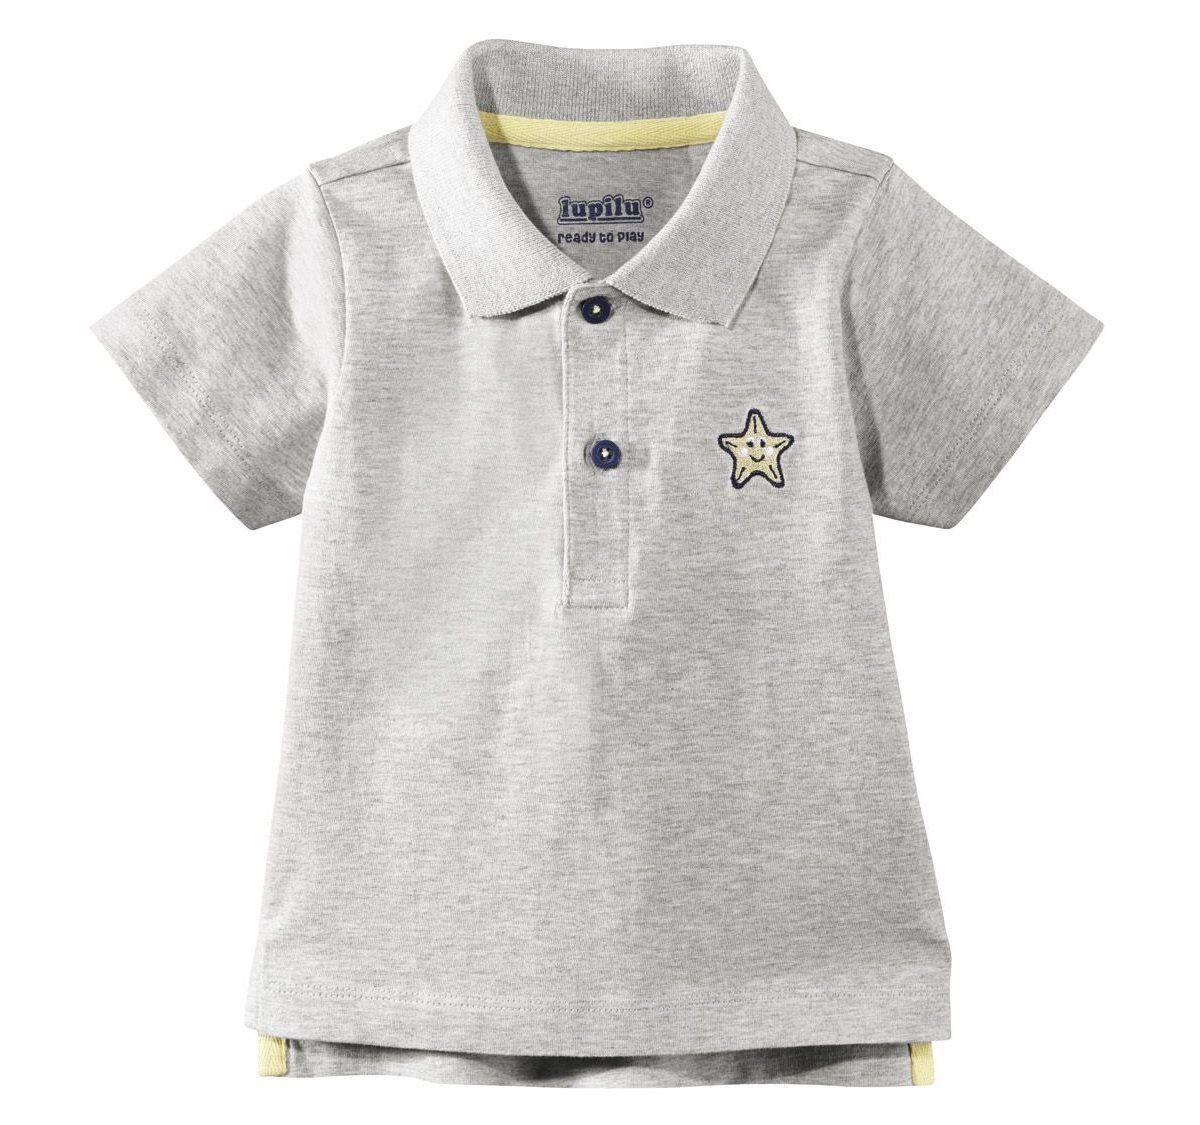 Lupilu Jungen Baby Poloshirt Grau Stern - Gr. 86/92